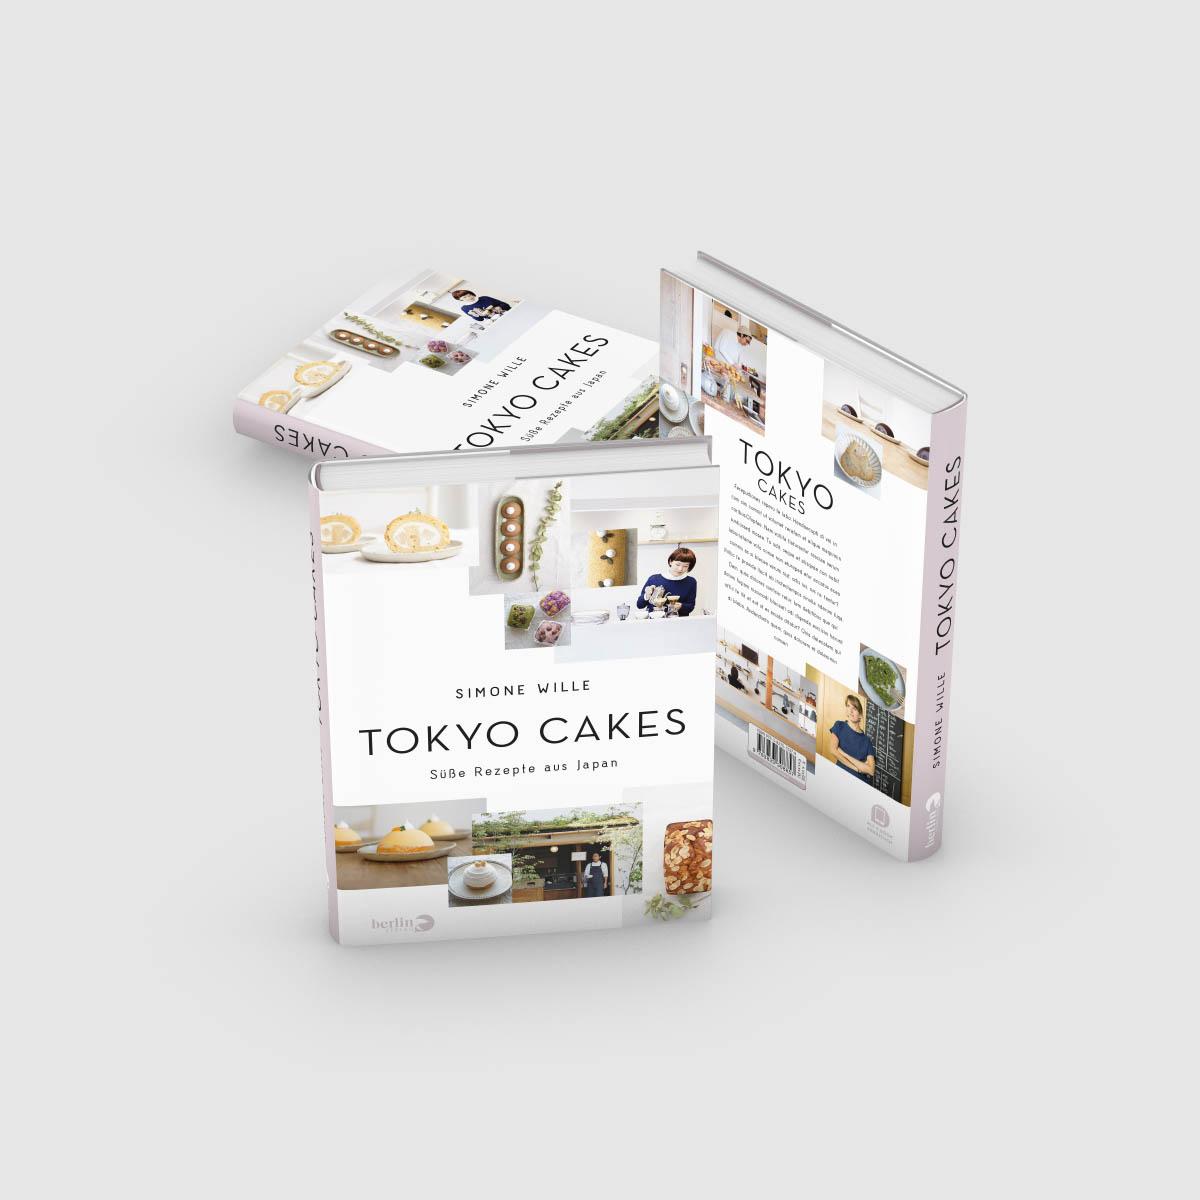 Simone Wille * Tokyo Cakes * Berlin Verlag